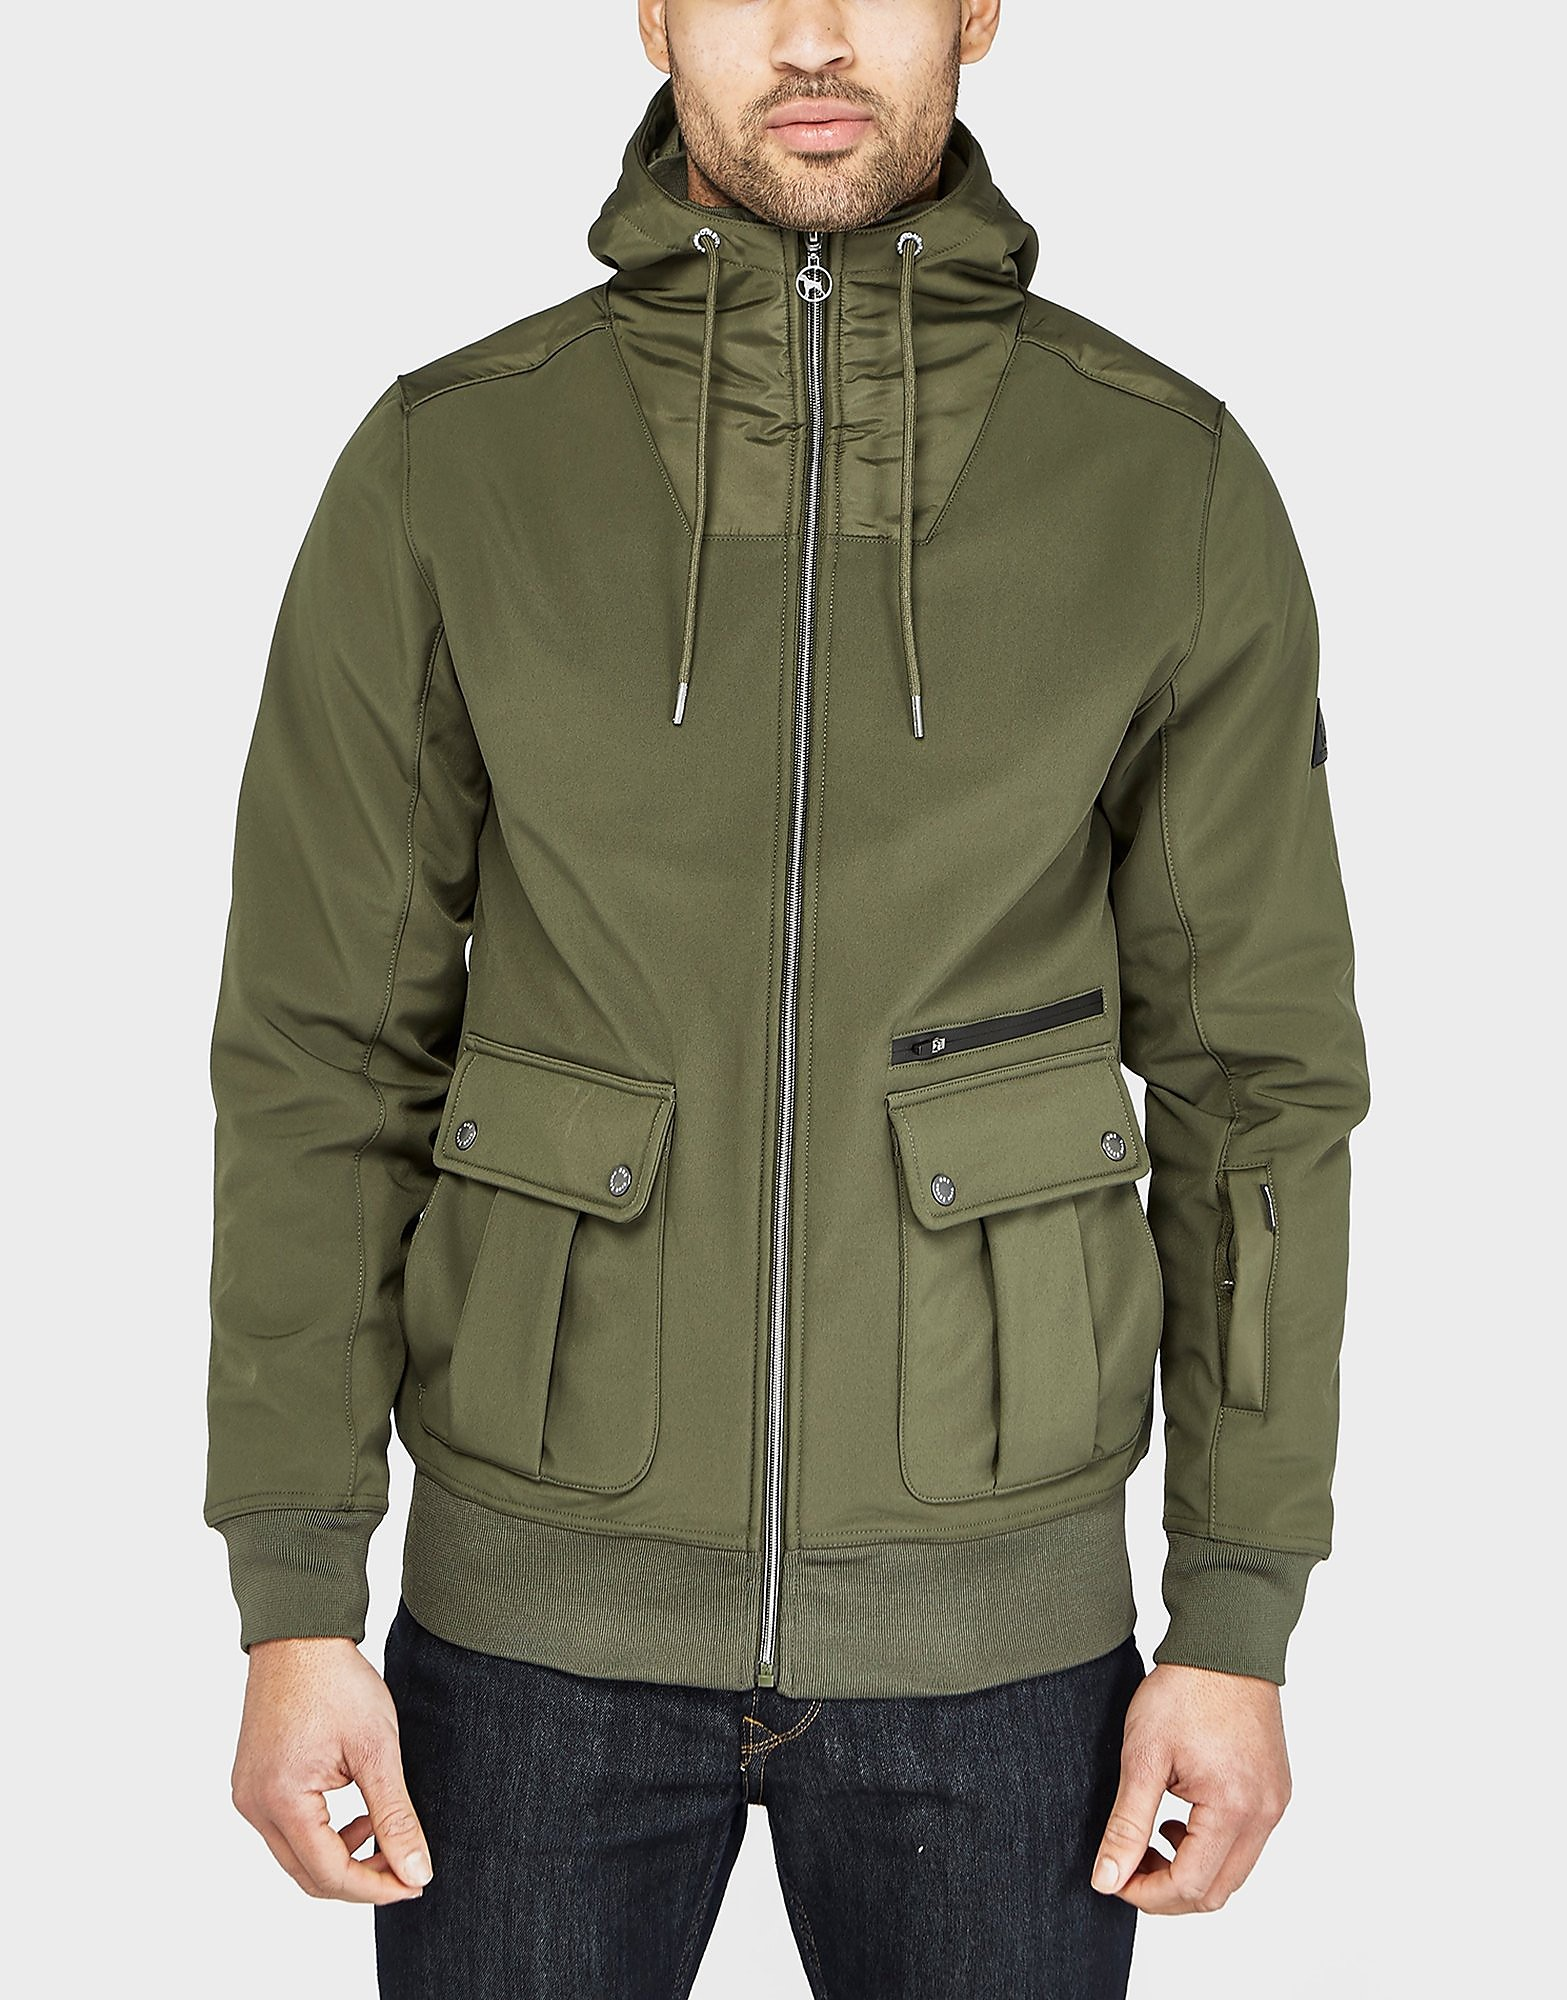 One True Saxon Grasmere Jacket - Exclusive